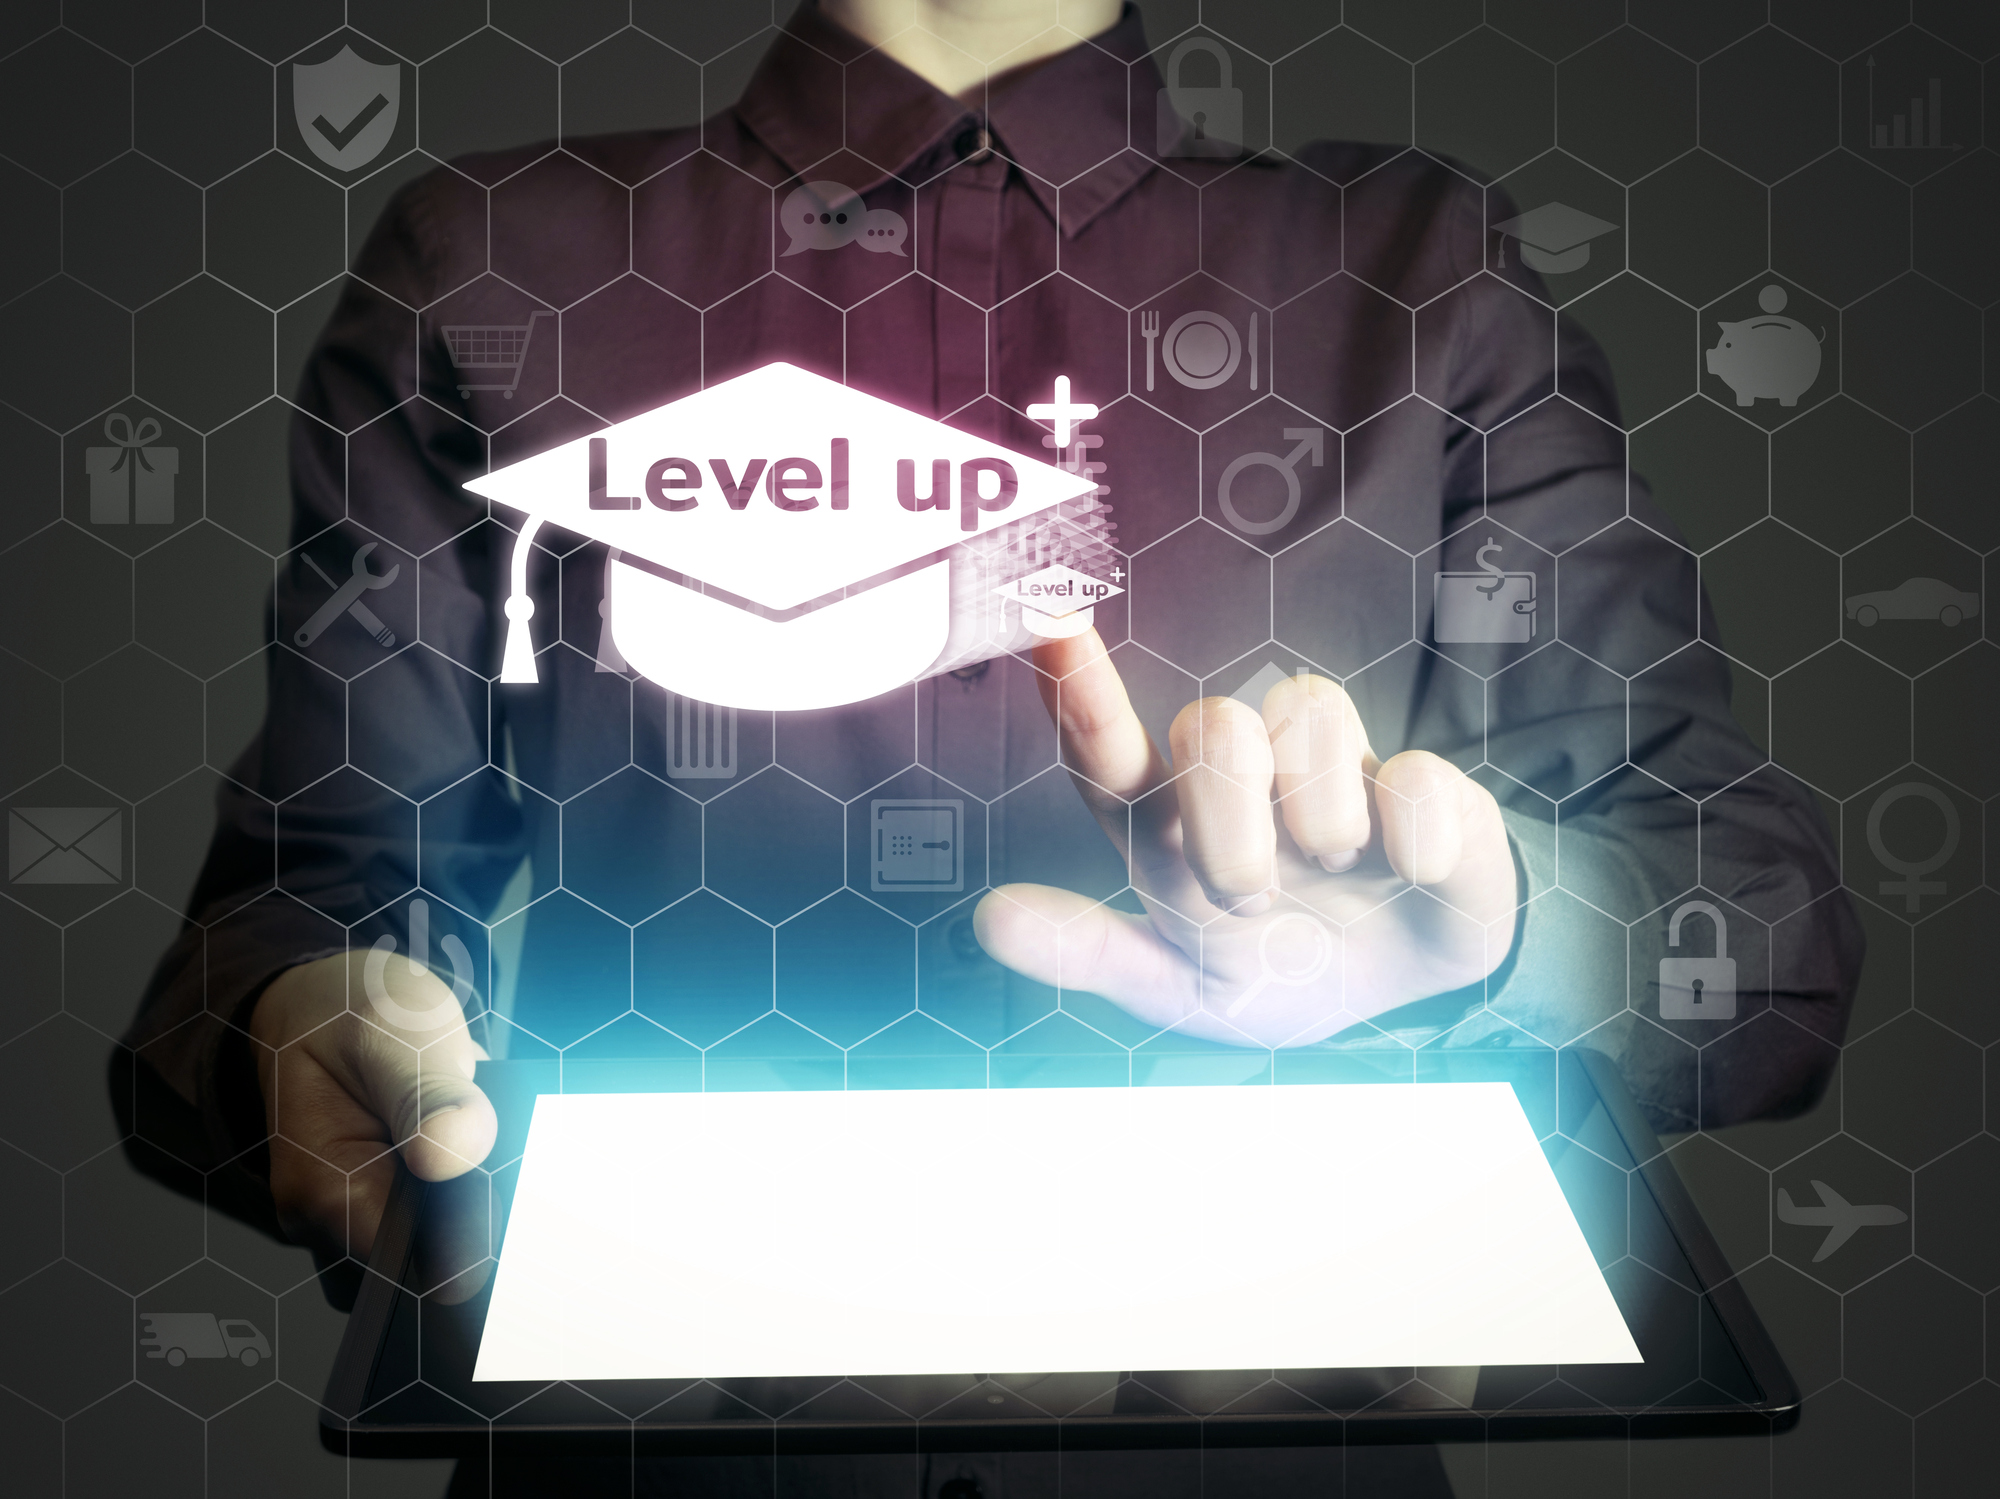 Cybersecurity Certifications Help Your Career